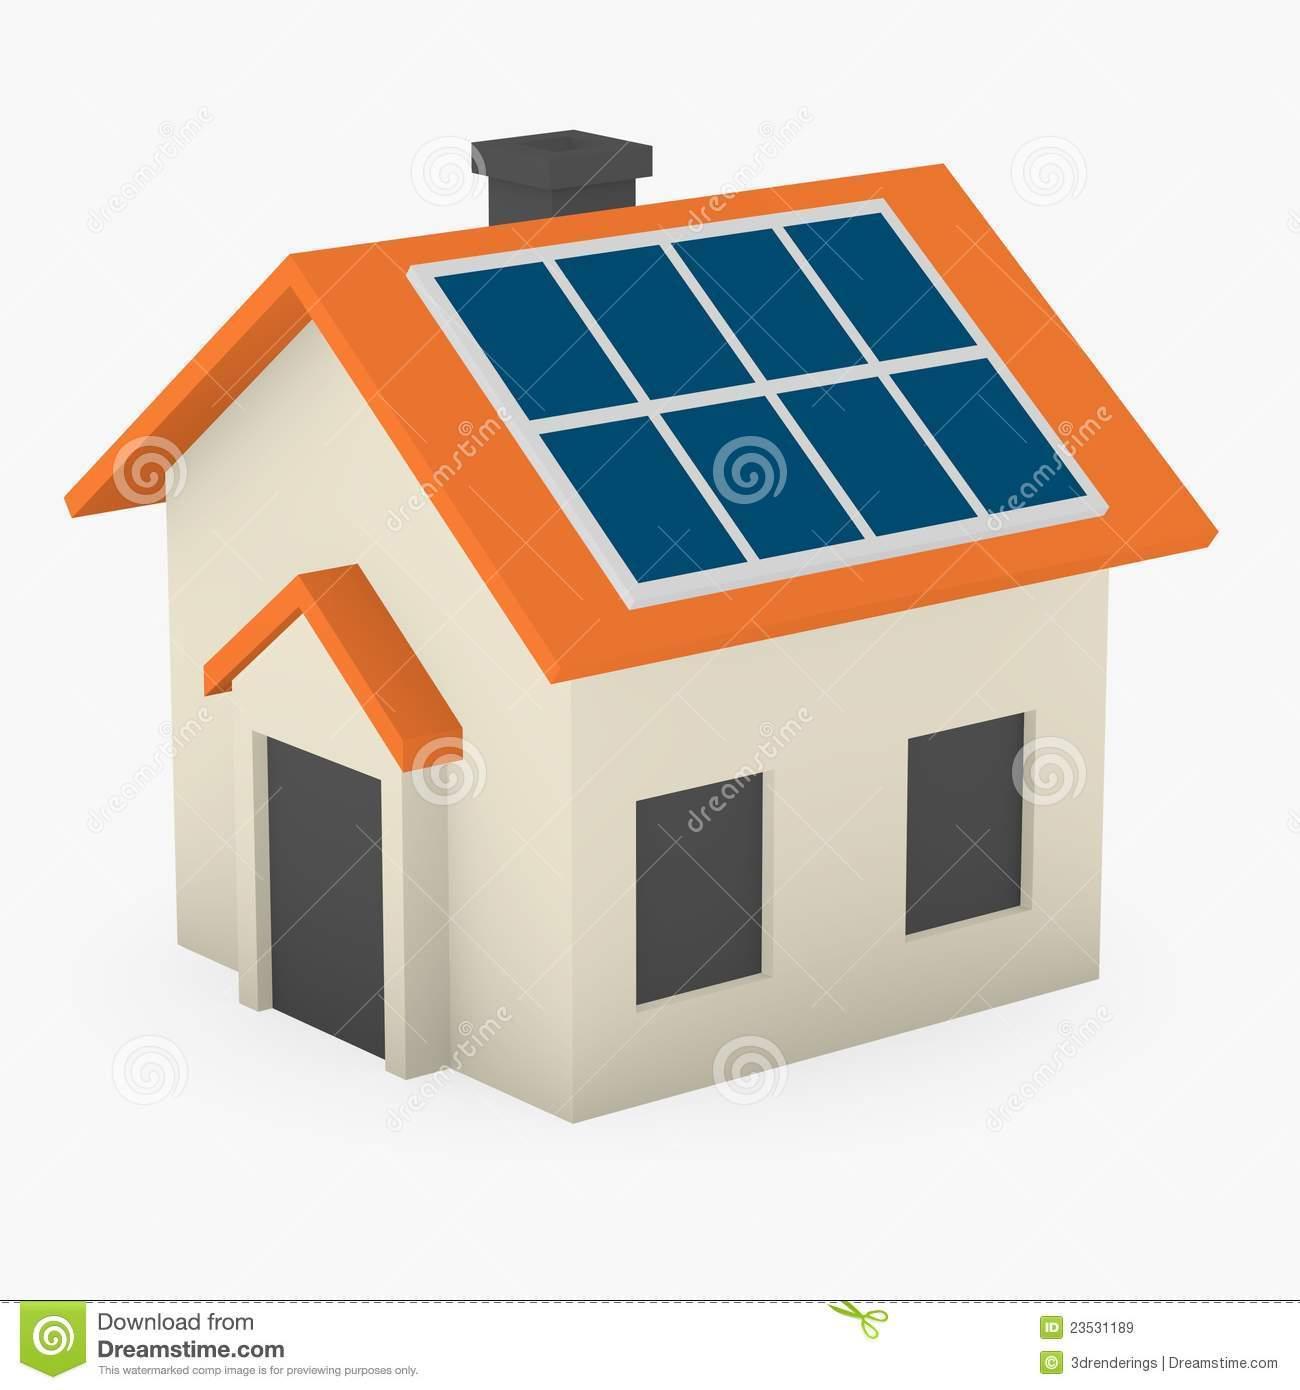 Solar panel house clipart 3 » Clipart Portal.